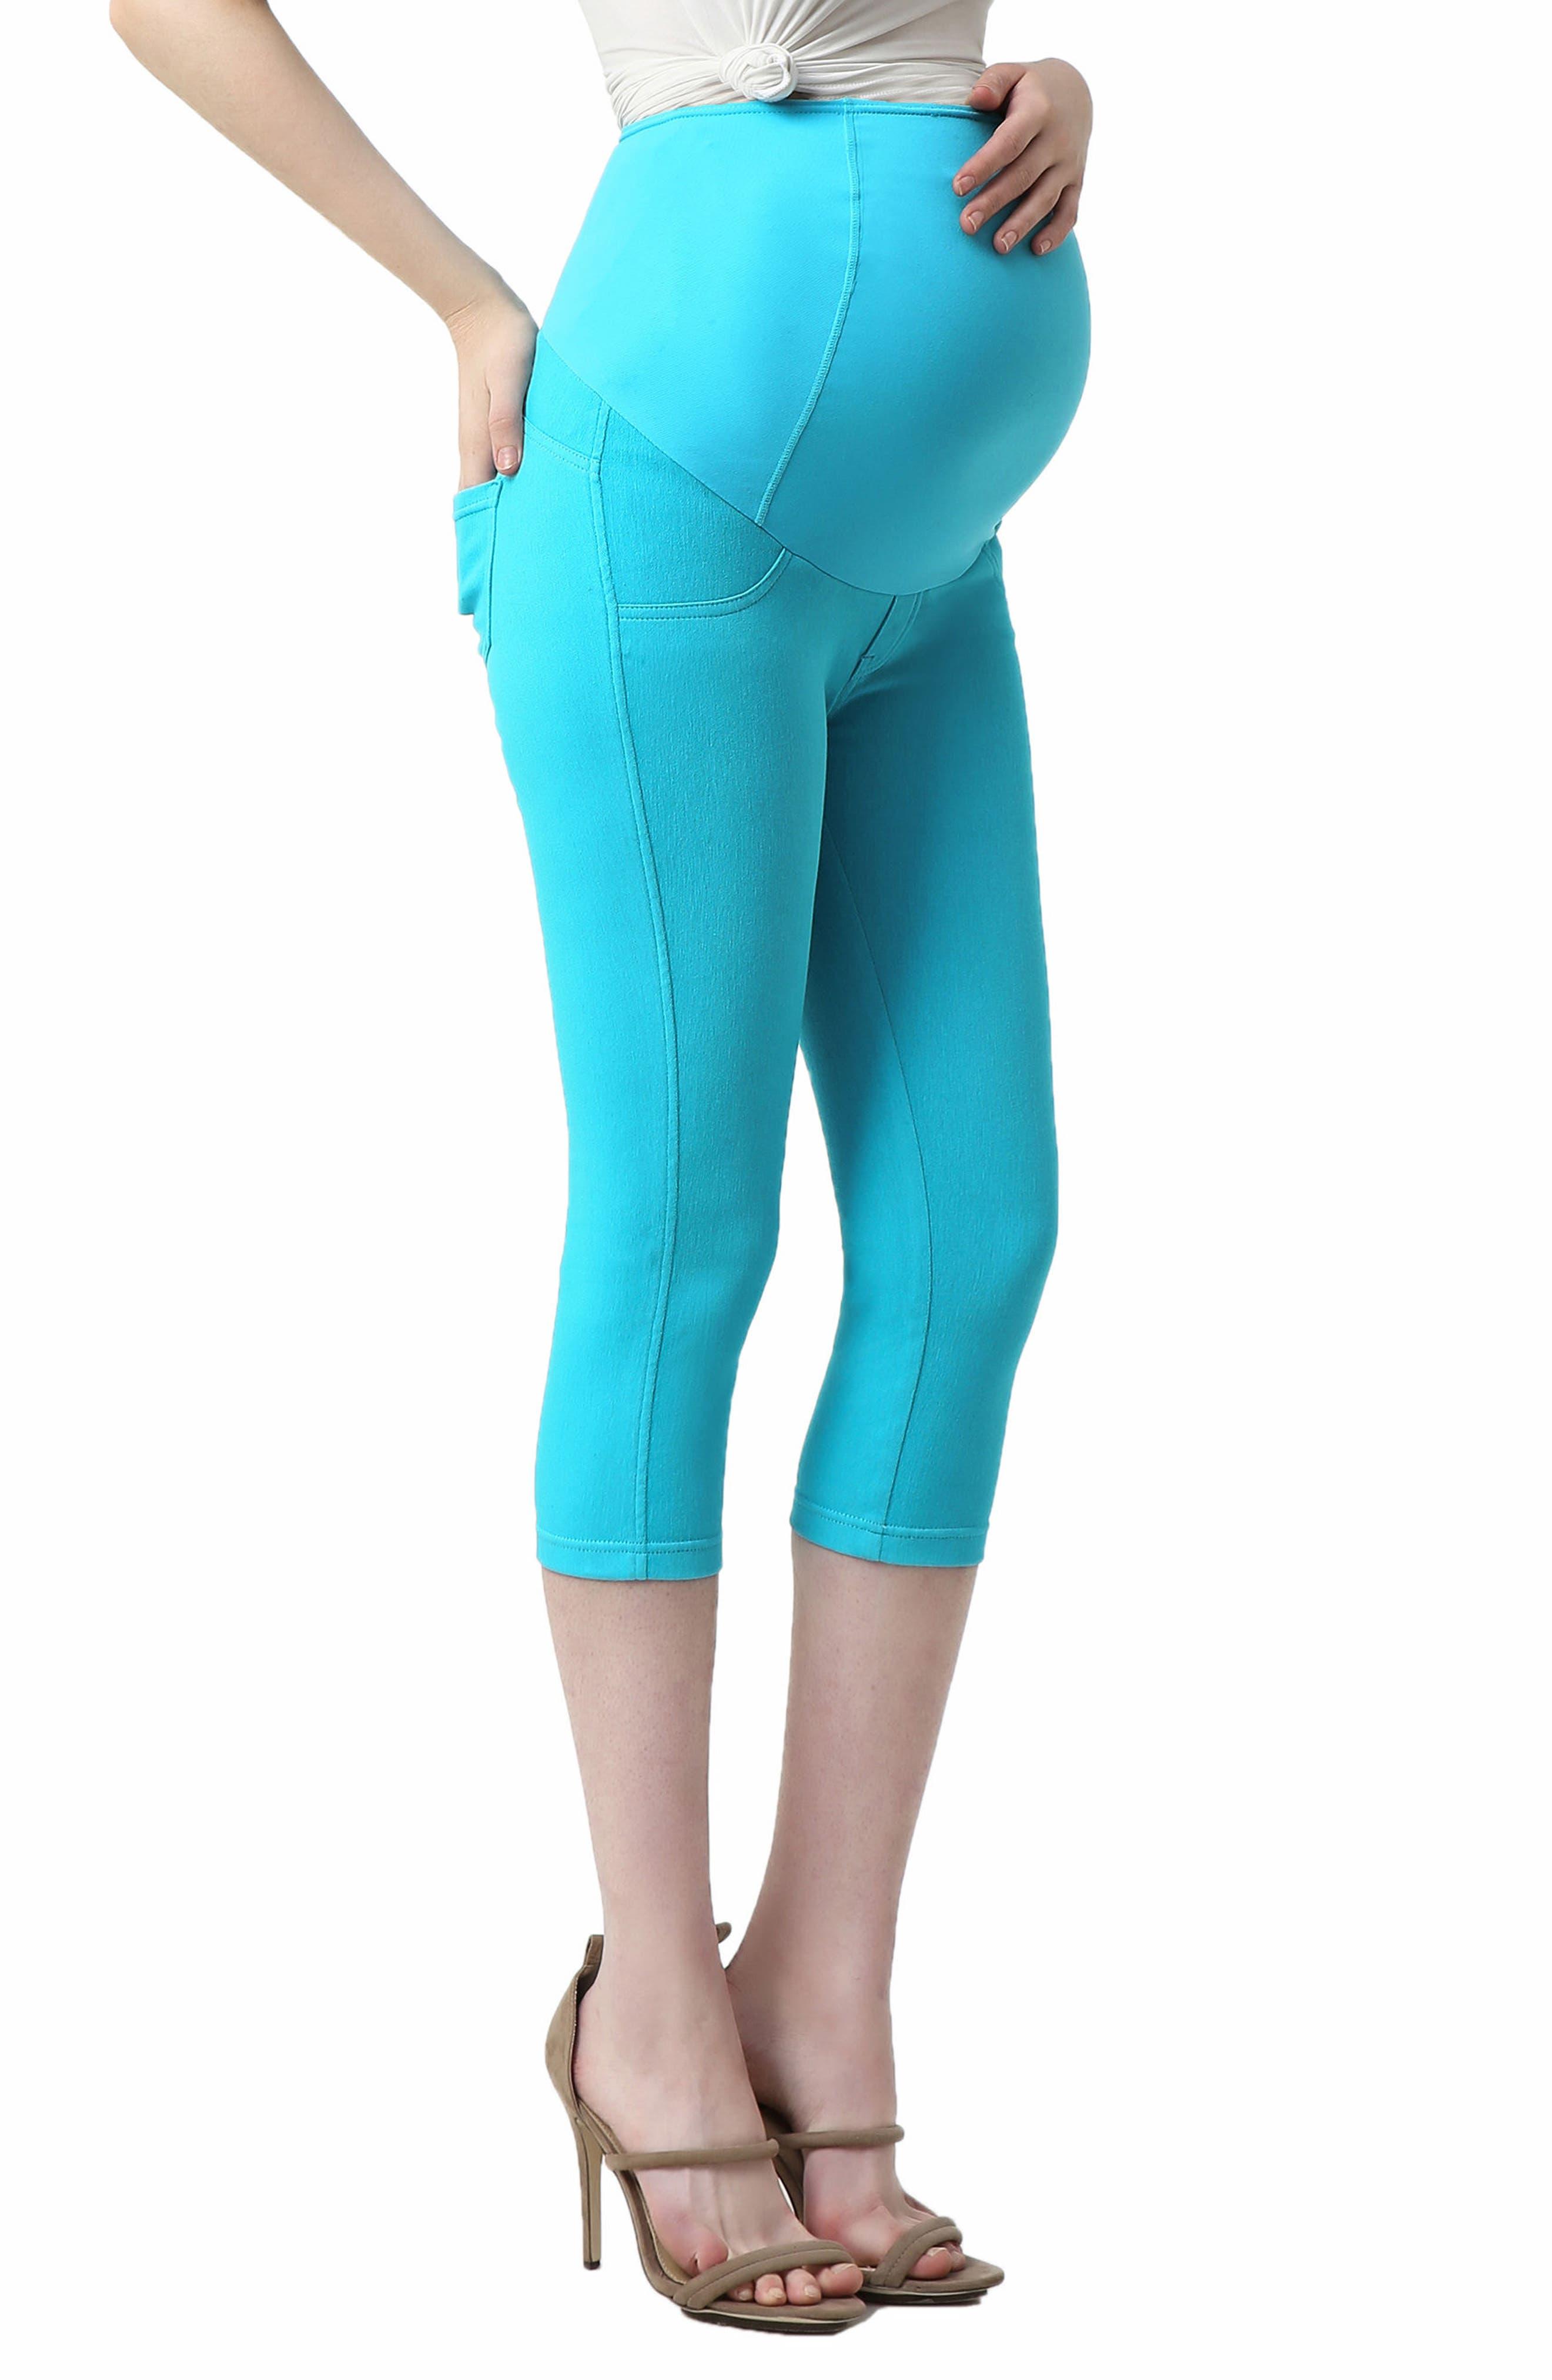 Melody Capri Denim Maternity Leggings,                             Alternate thumbnail 3, color,                             Aqua Blue